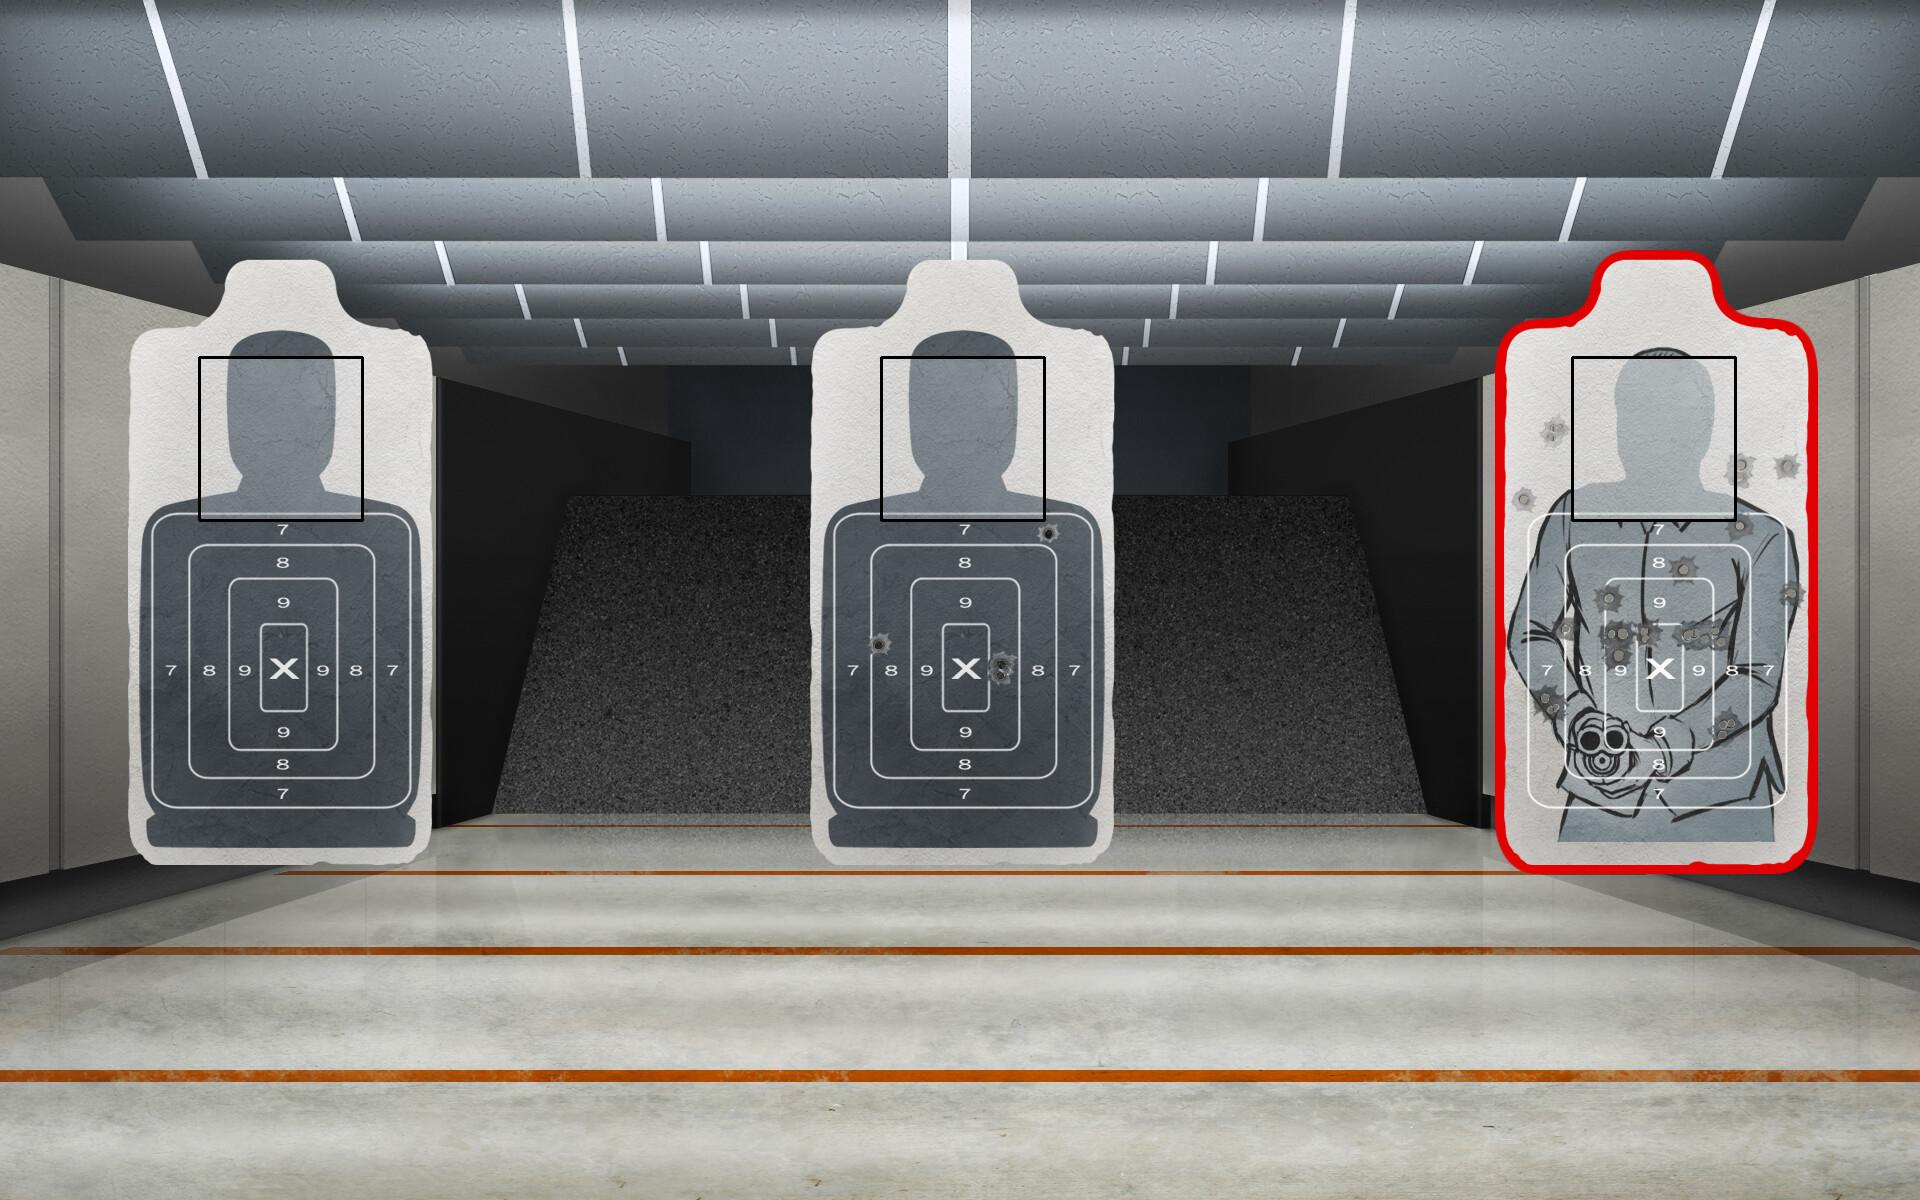 Julian vidales shooting range with targets